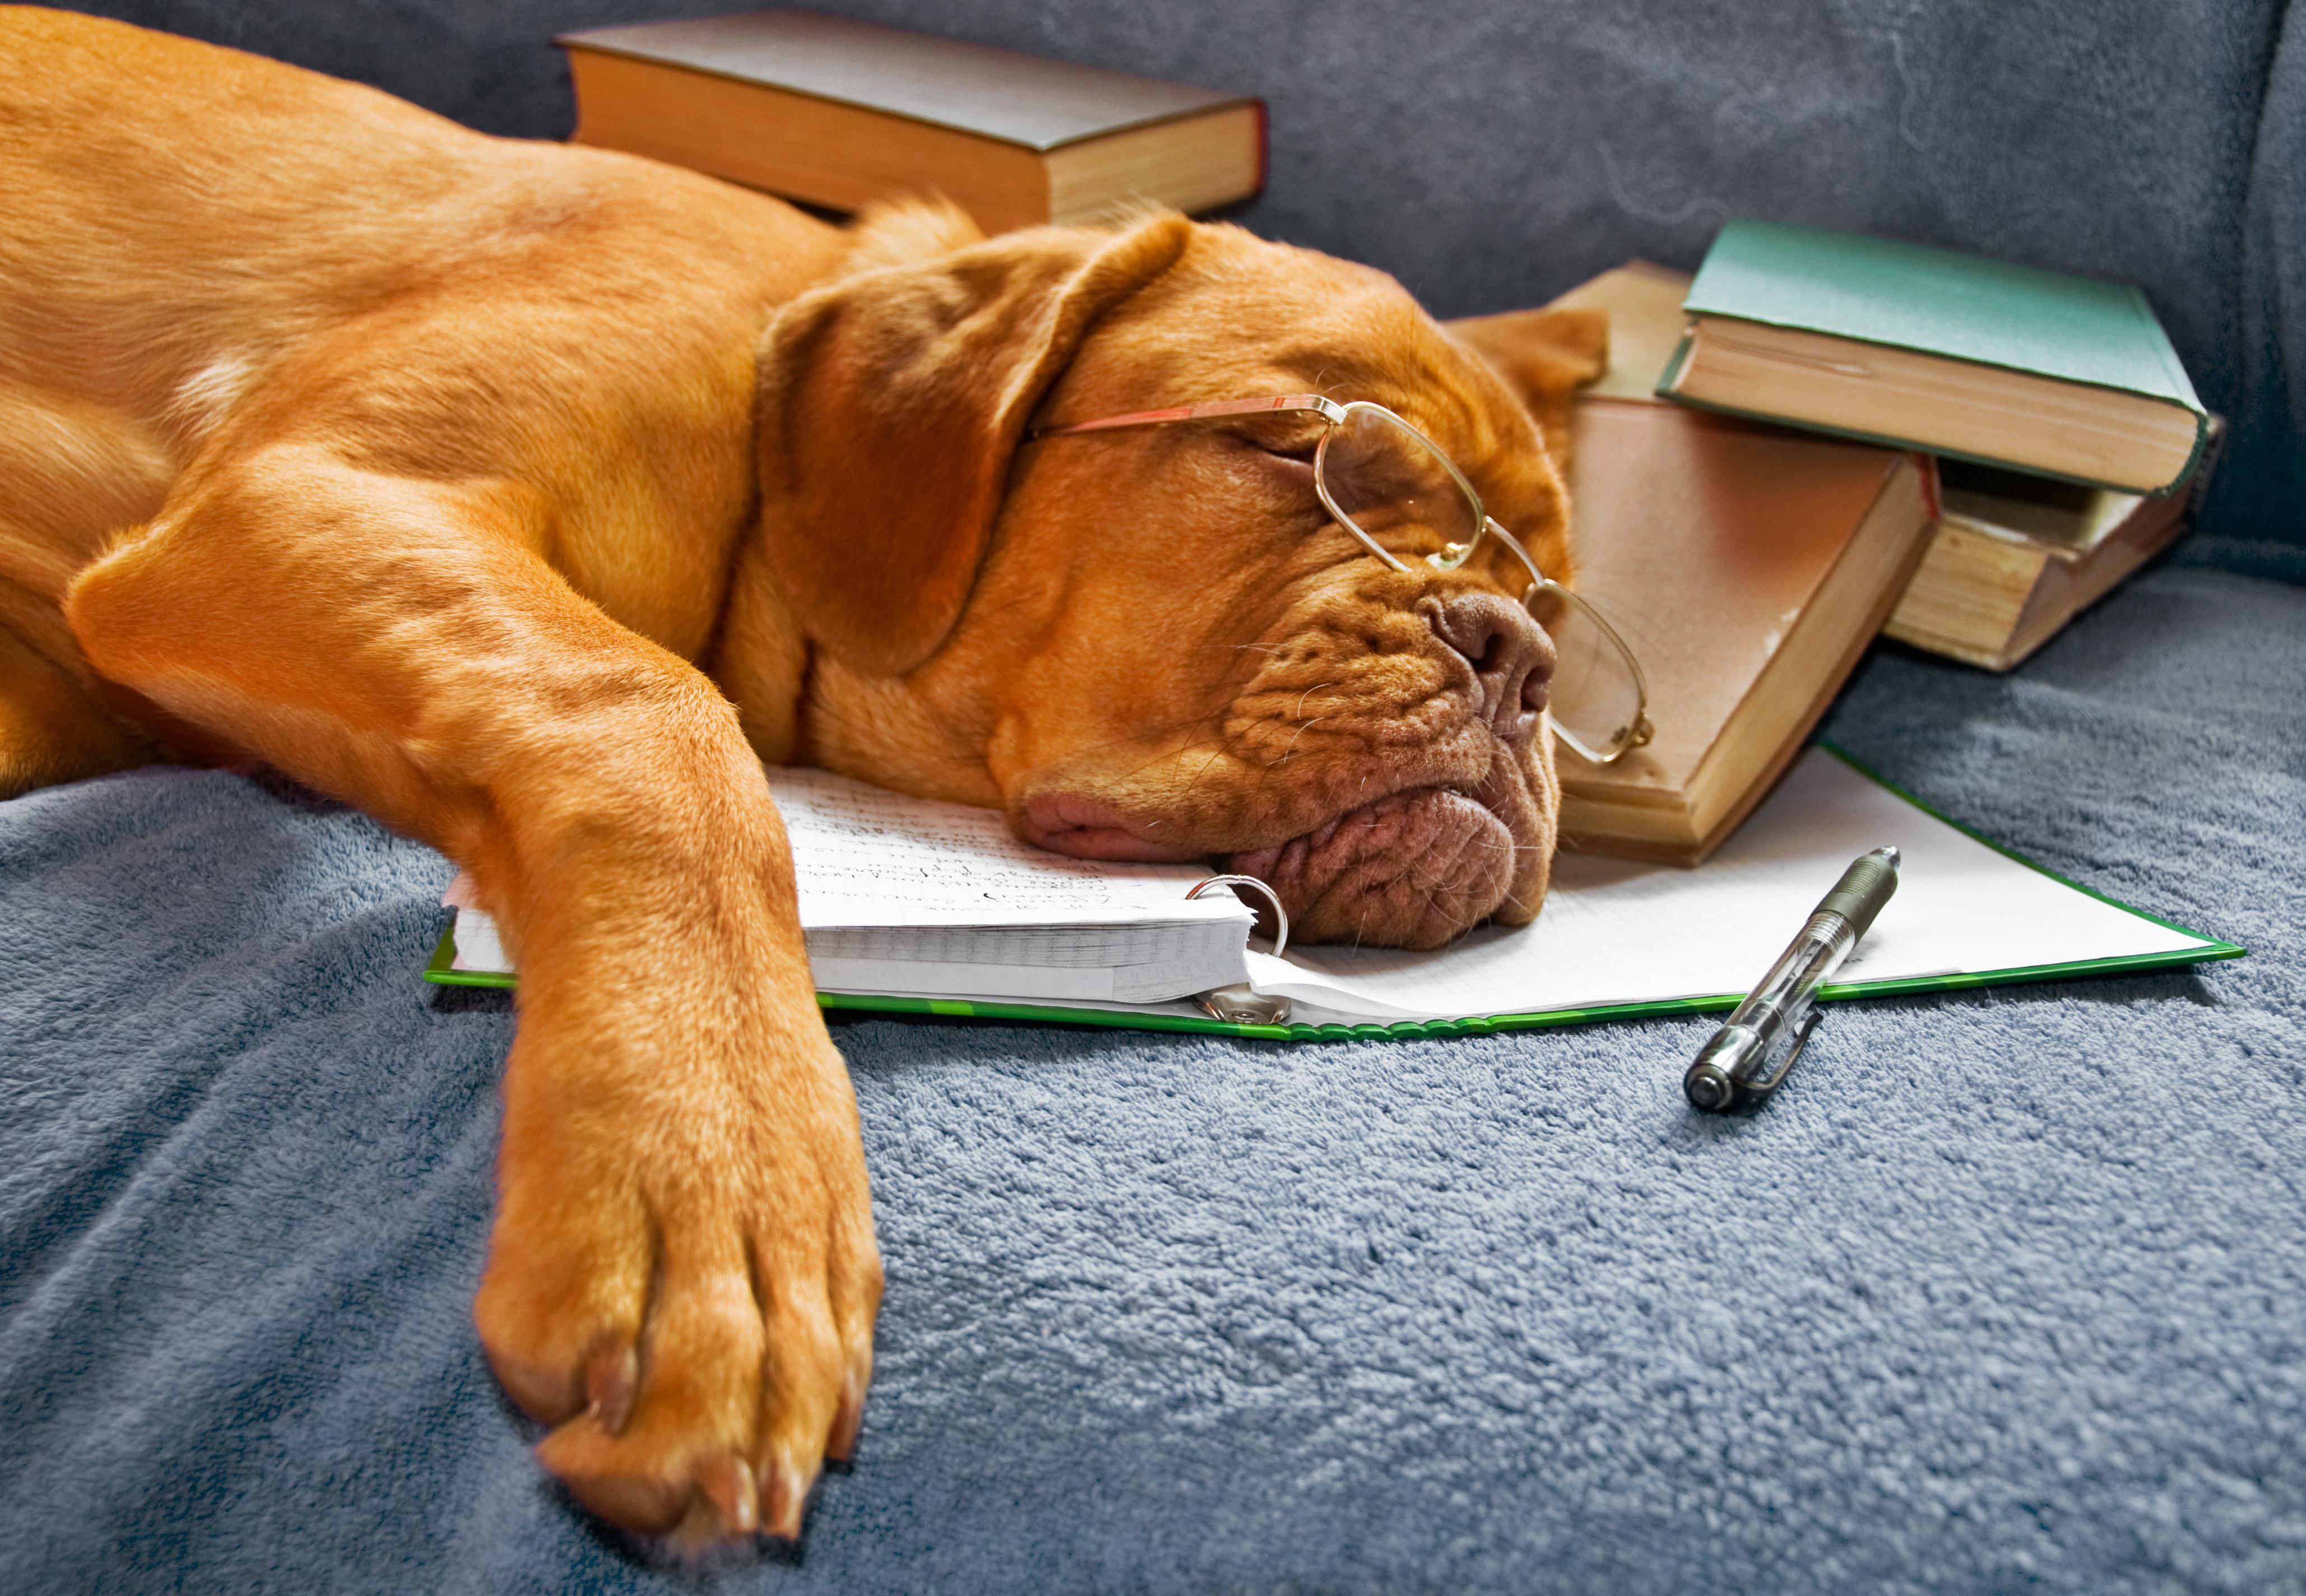 Gero miego taisyklės